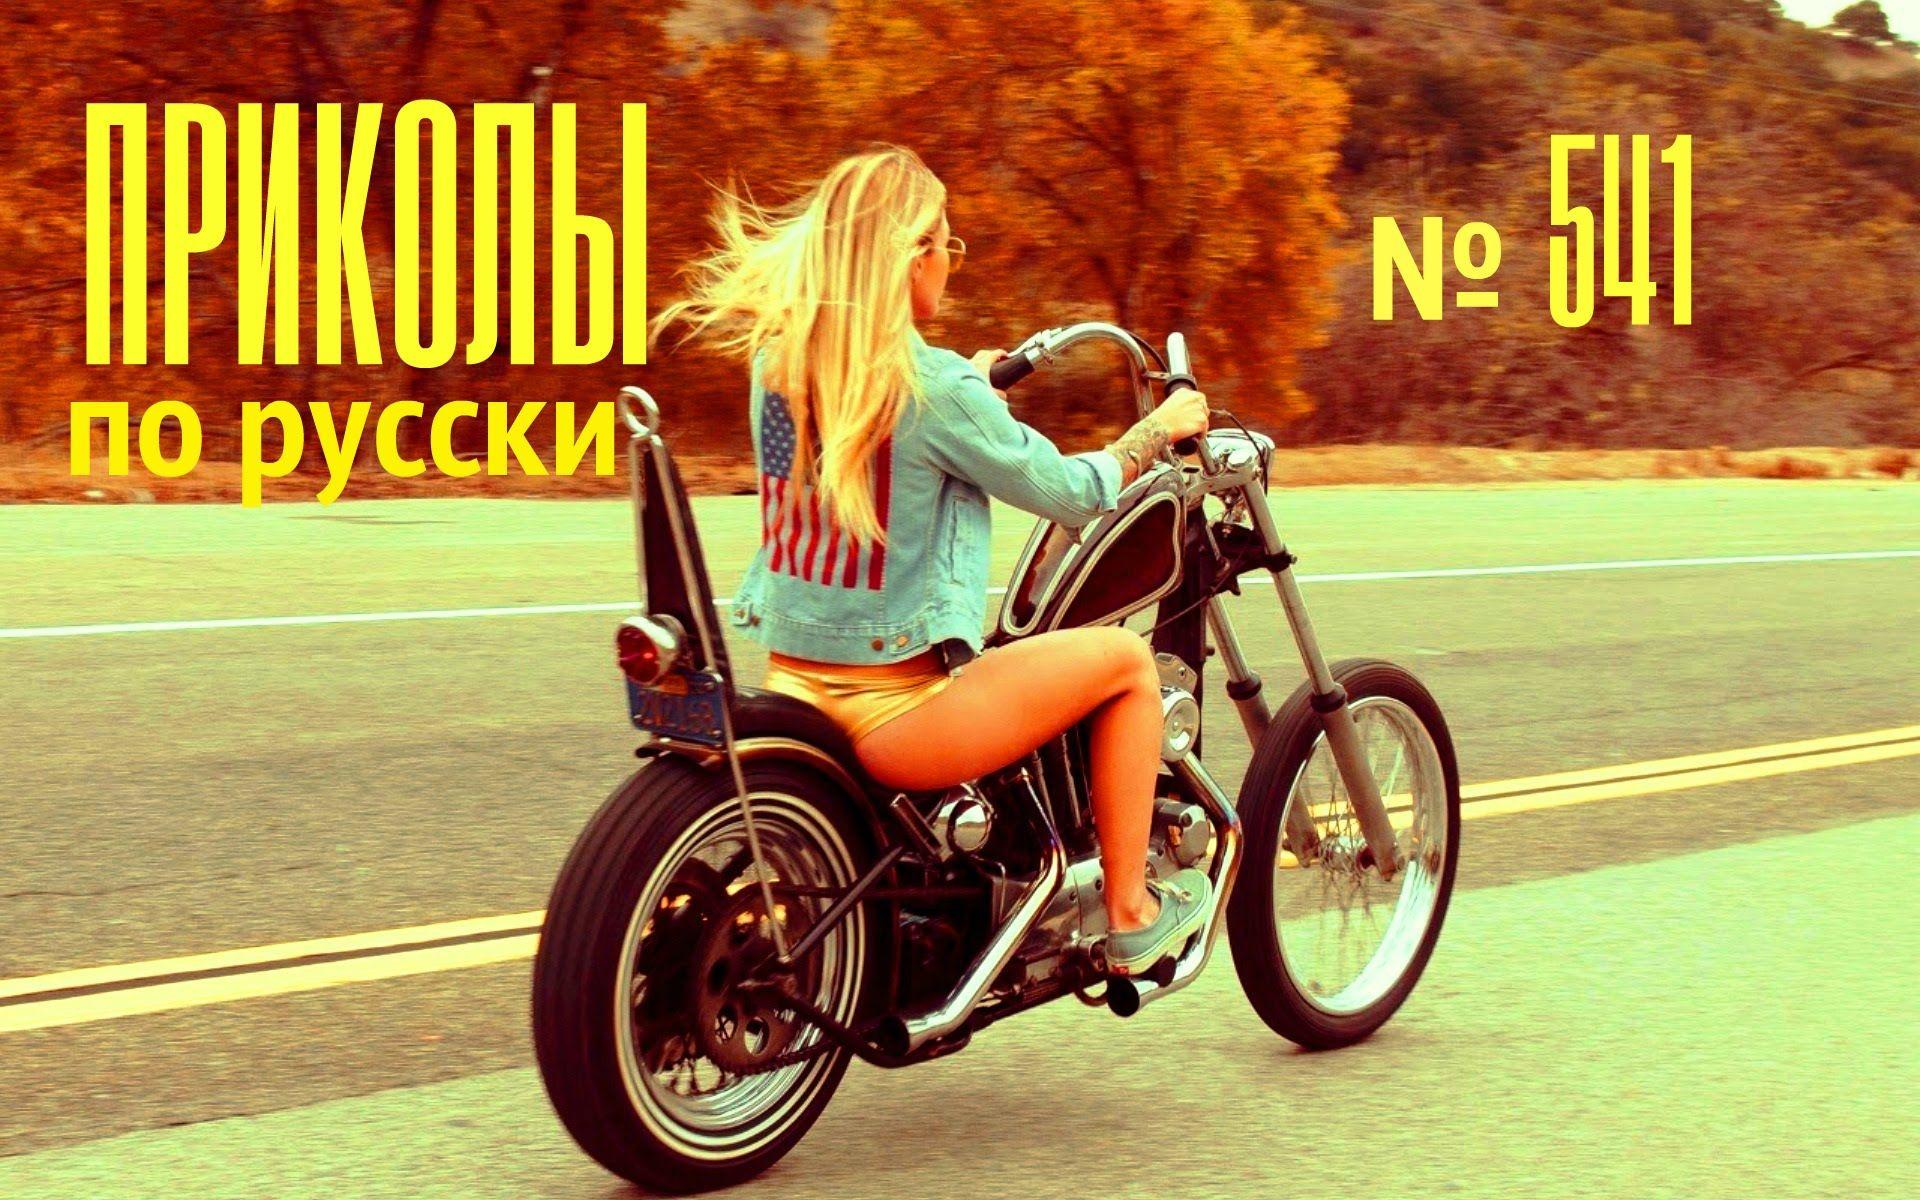 Бульмастиф картинки, приколы по русски 2016 картинки